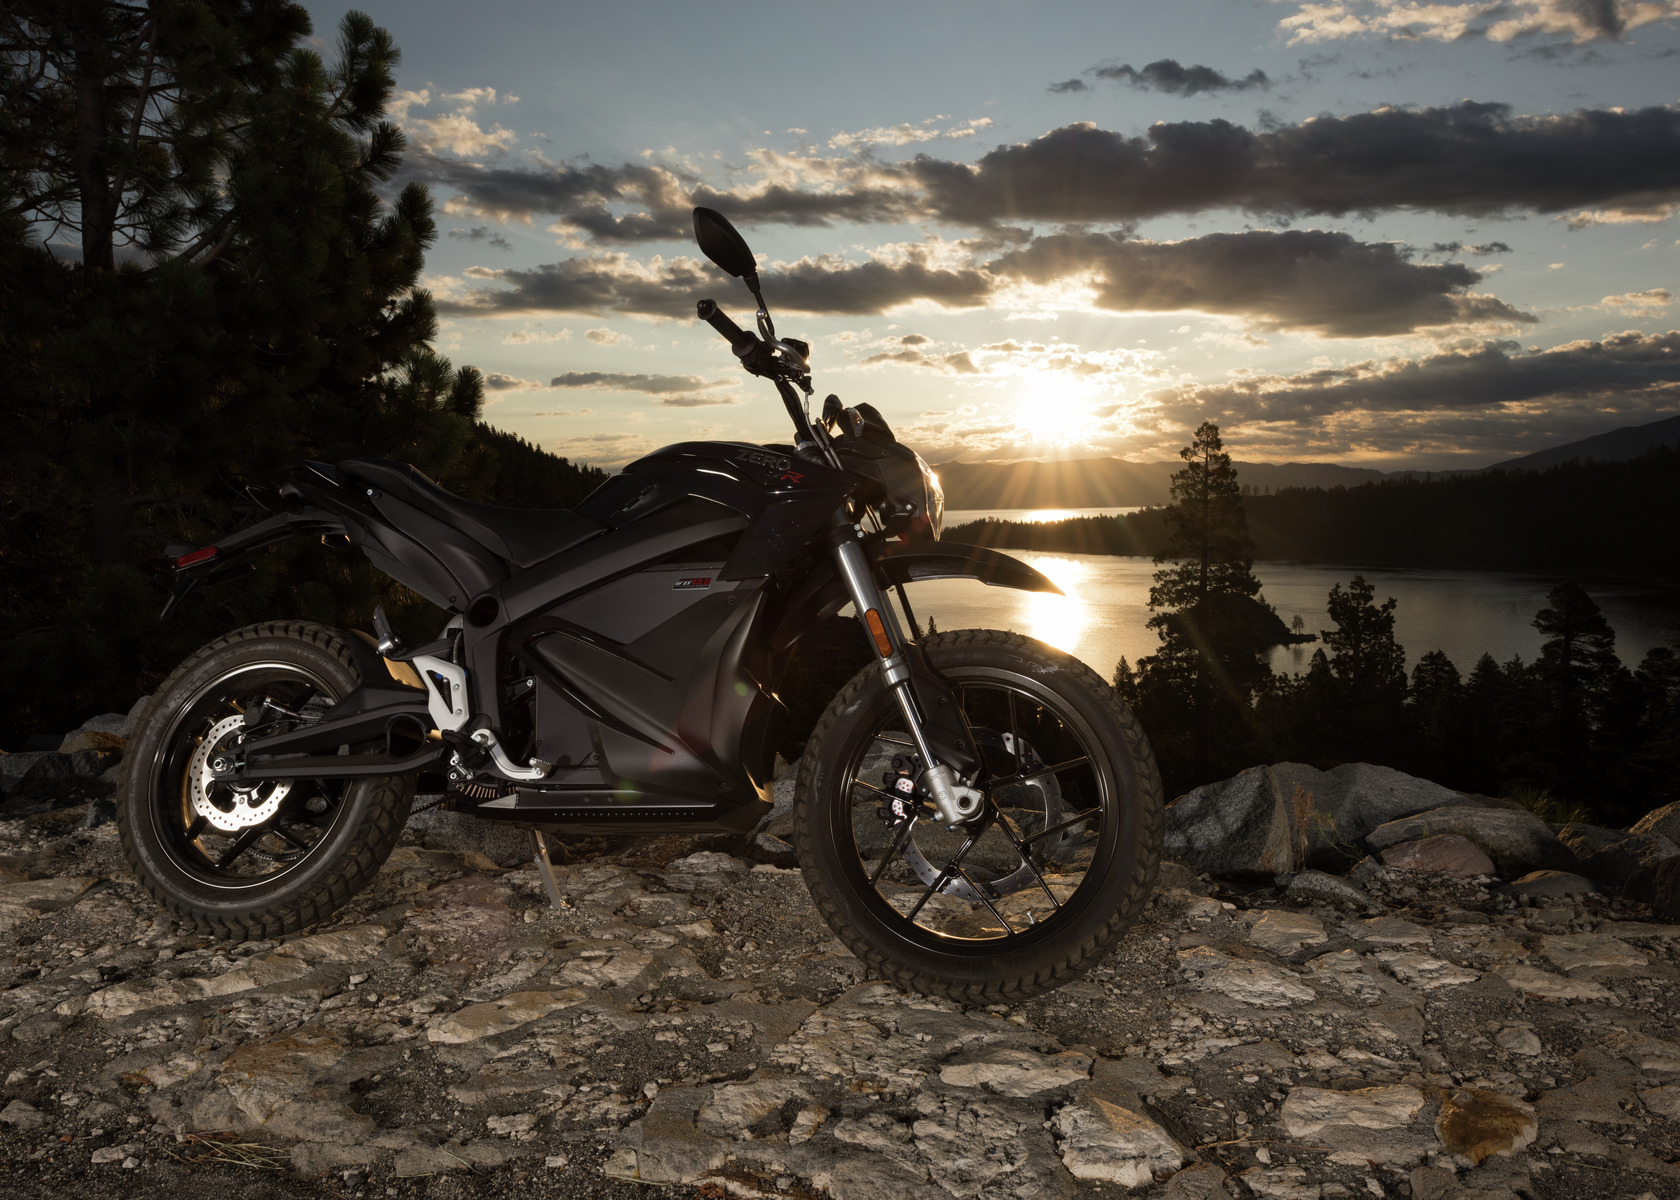 2016 Zero DSR Electric Motorcycle: